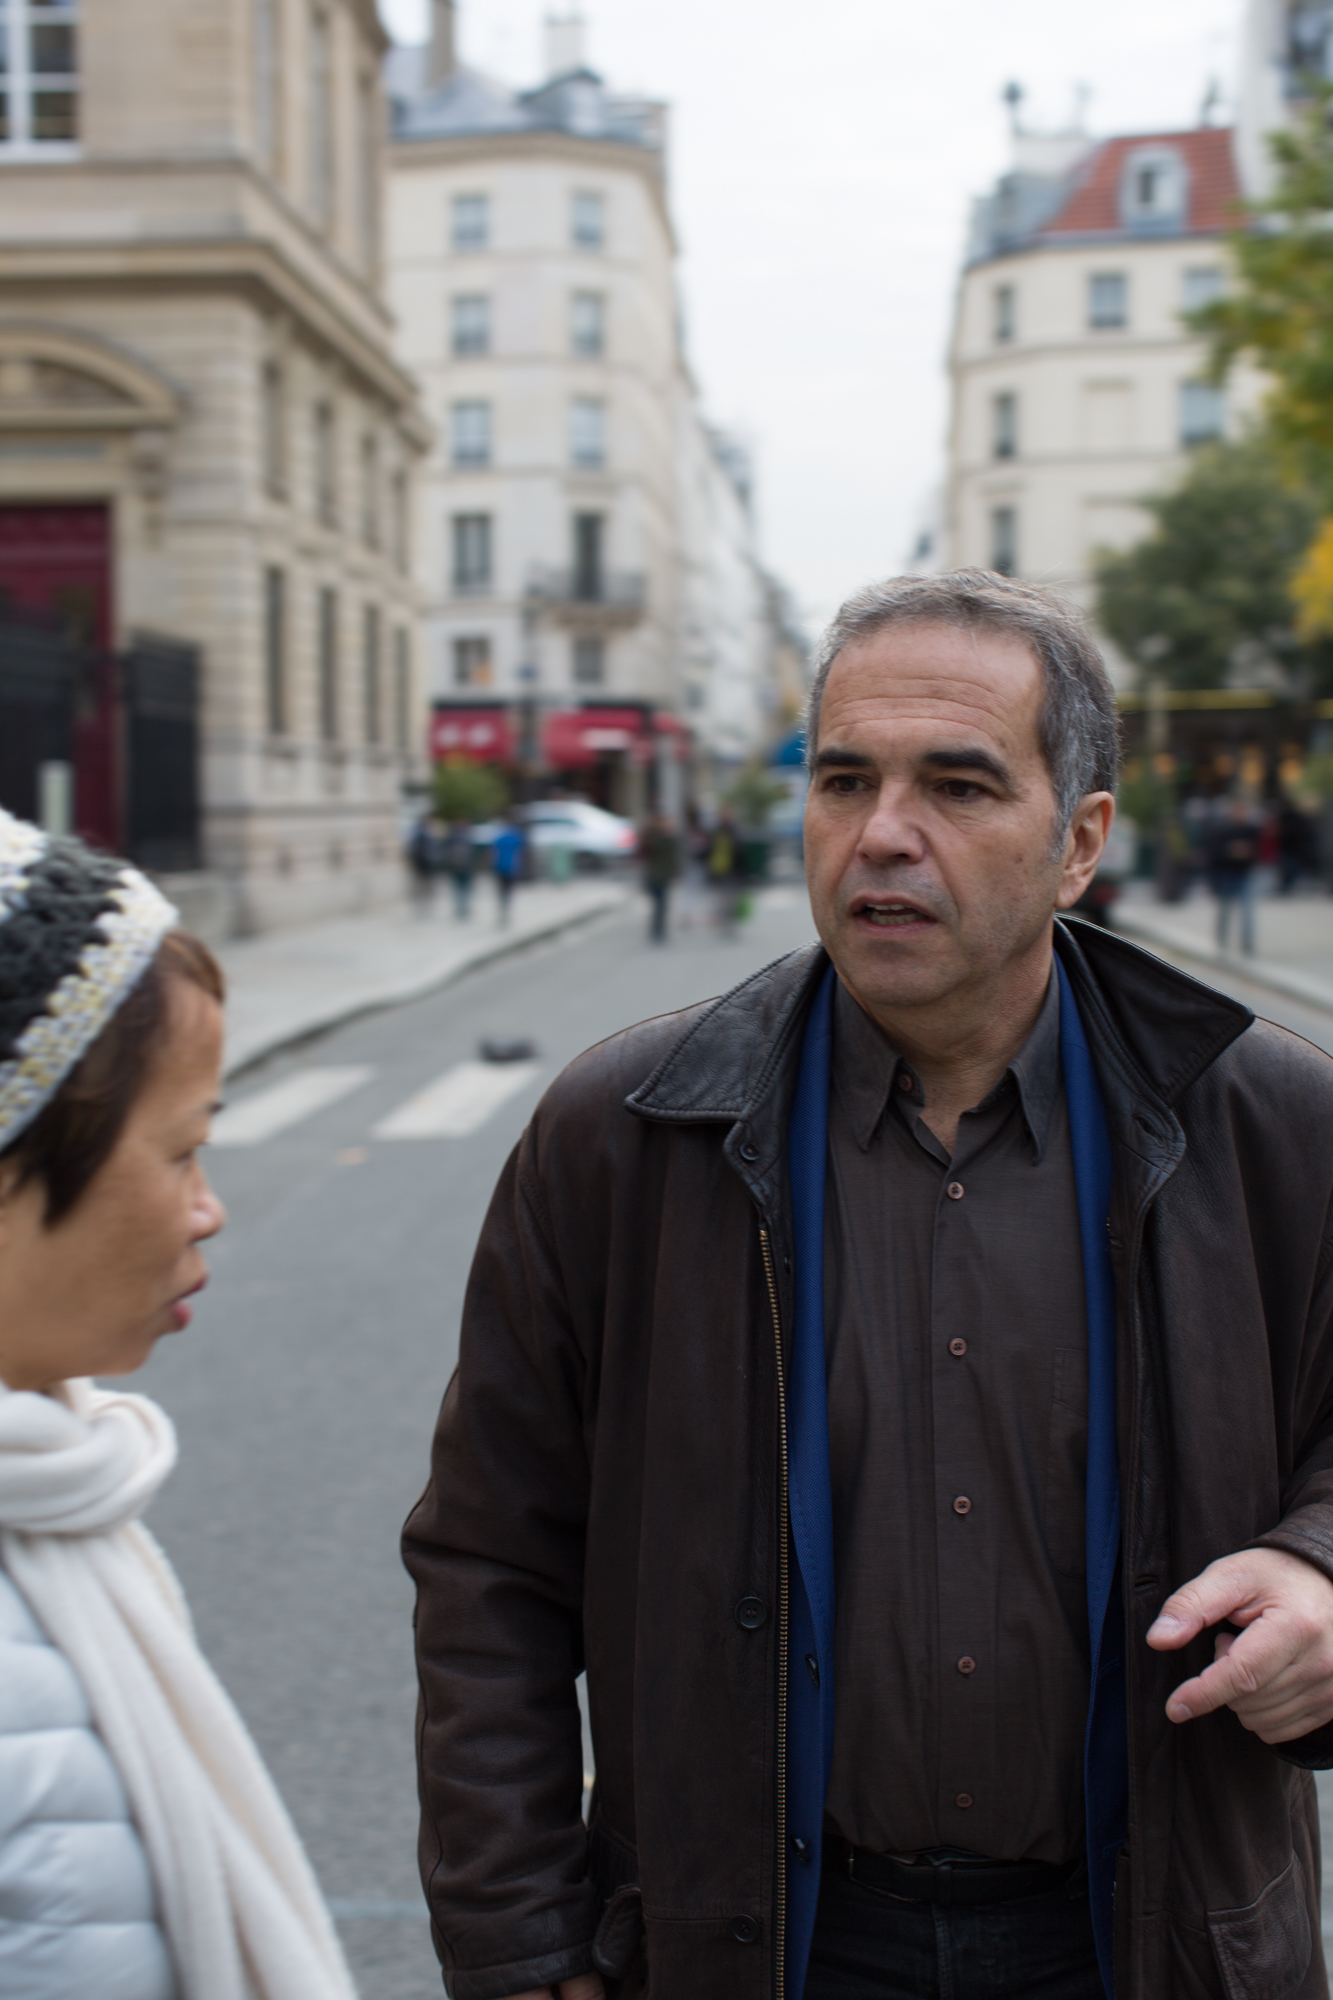 Thierry do Espirito private guide